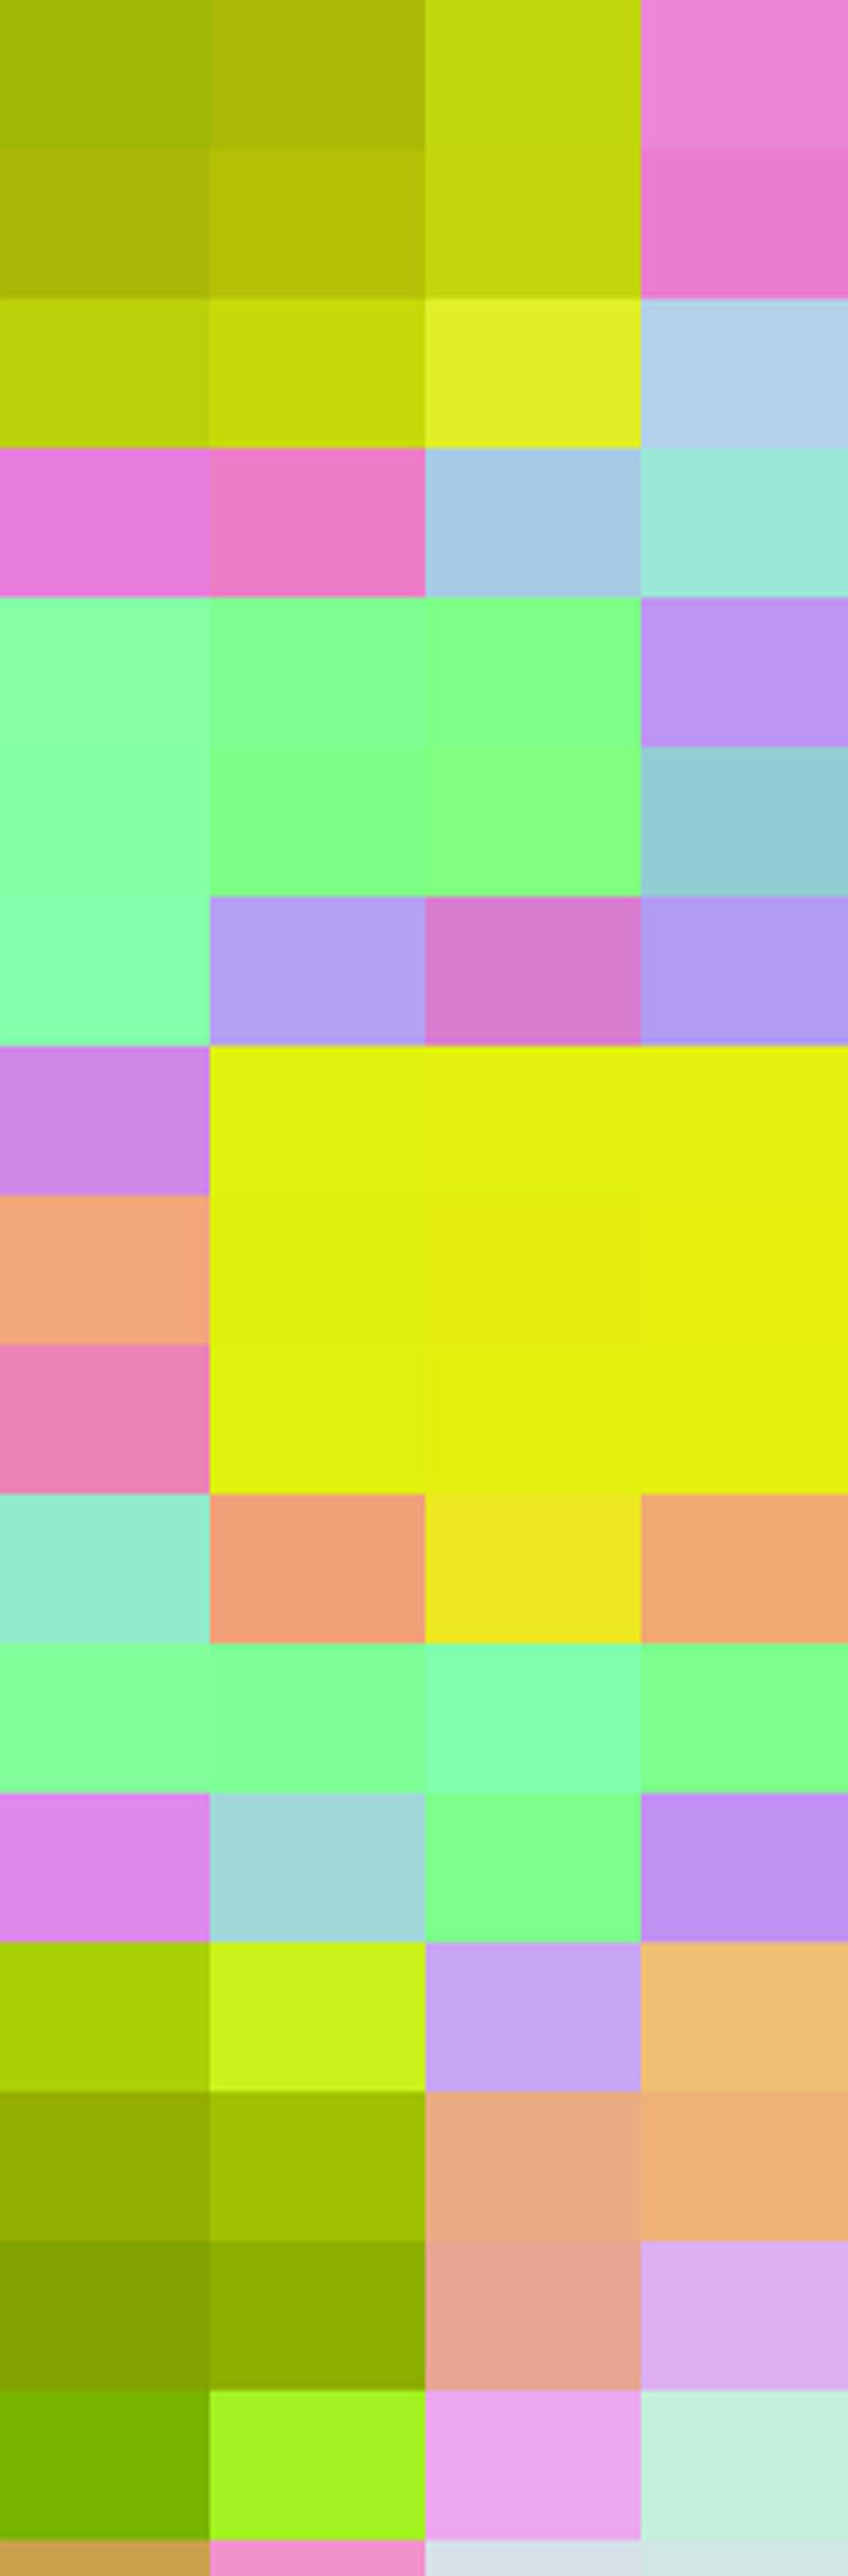 MB Pixel 1-120